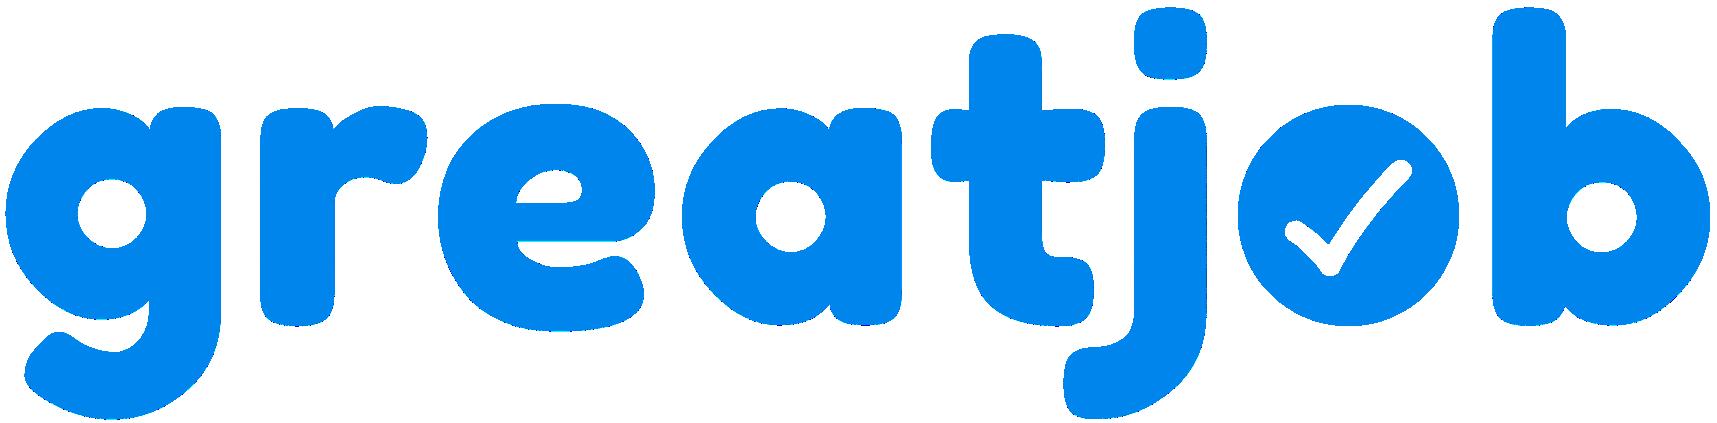 logo greatjob blue text